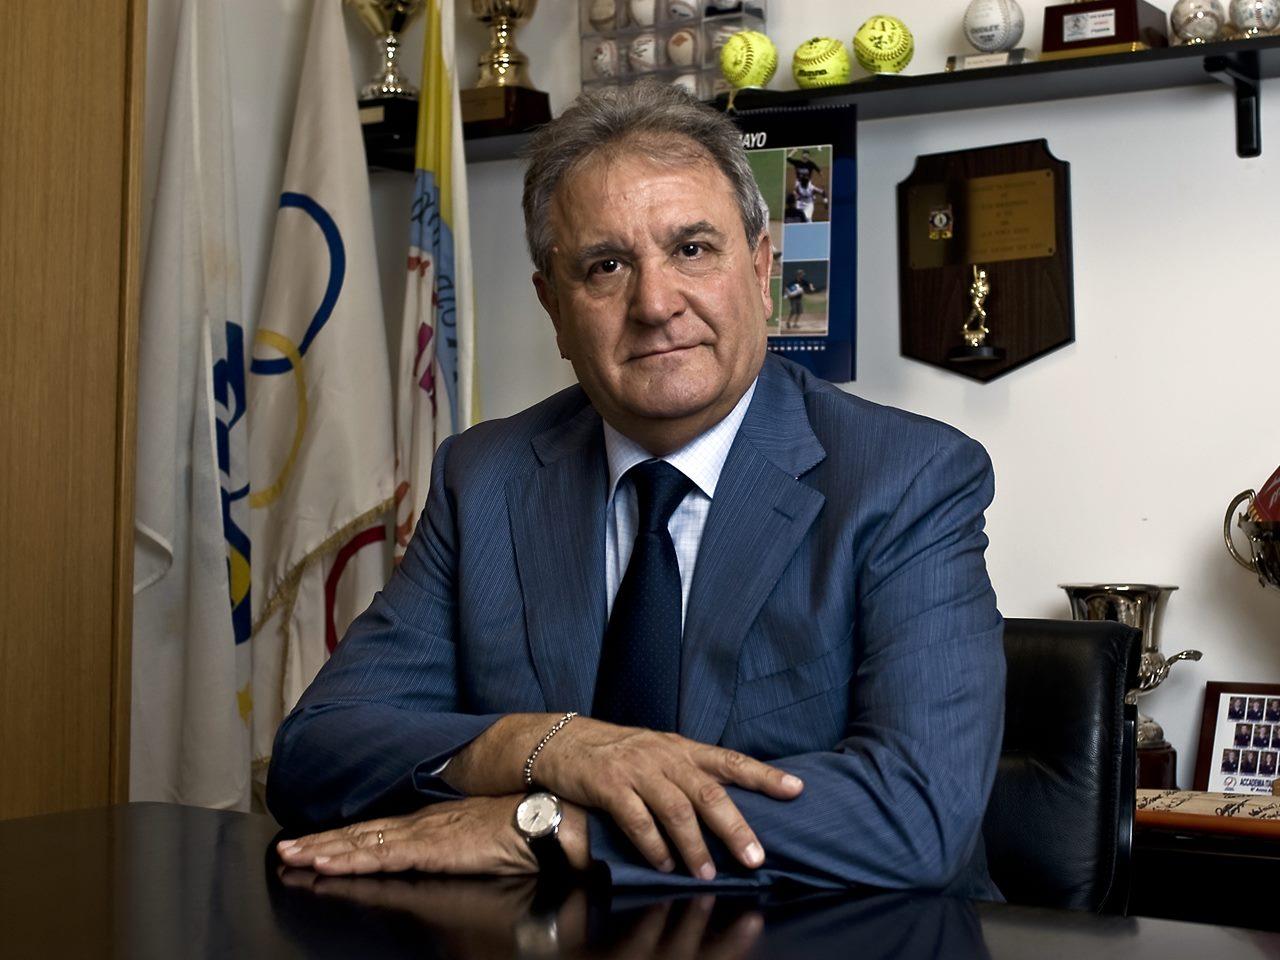 WBSC_President_Fraccari_EZR6085